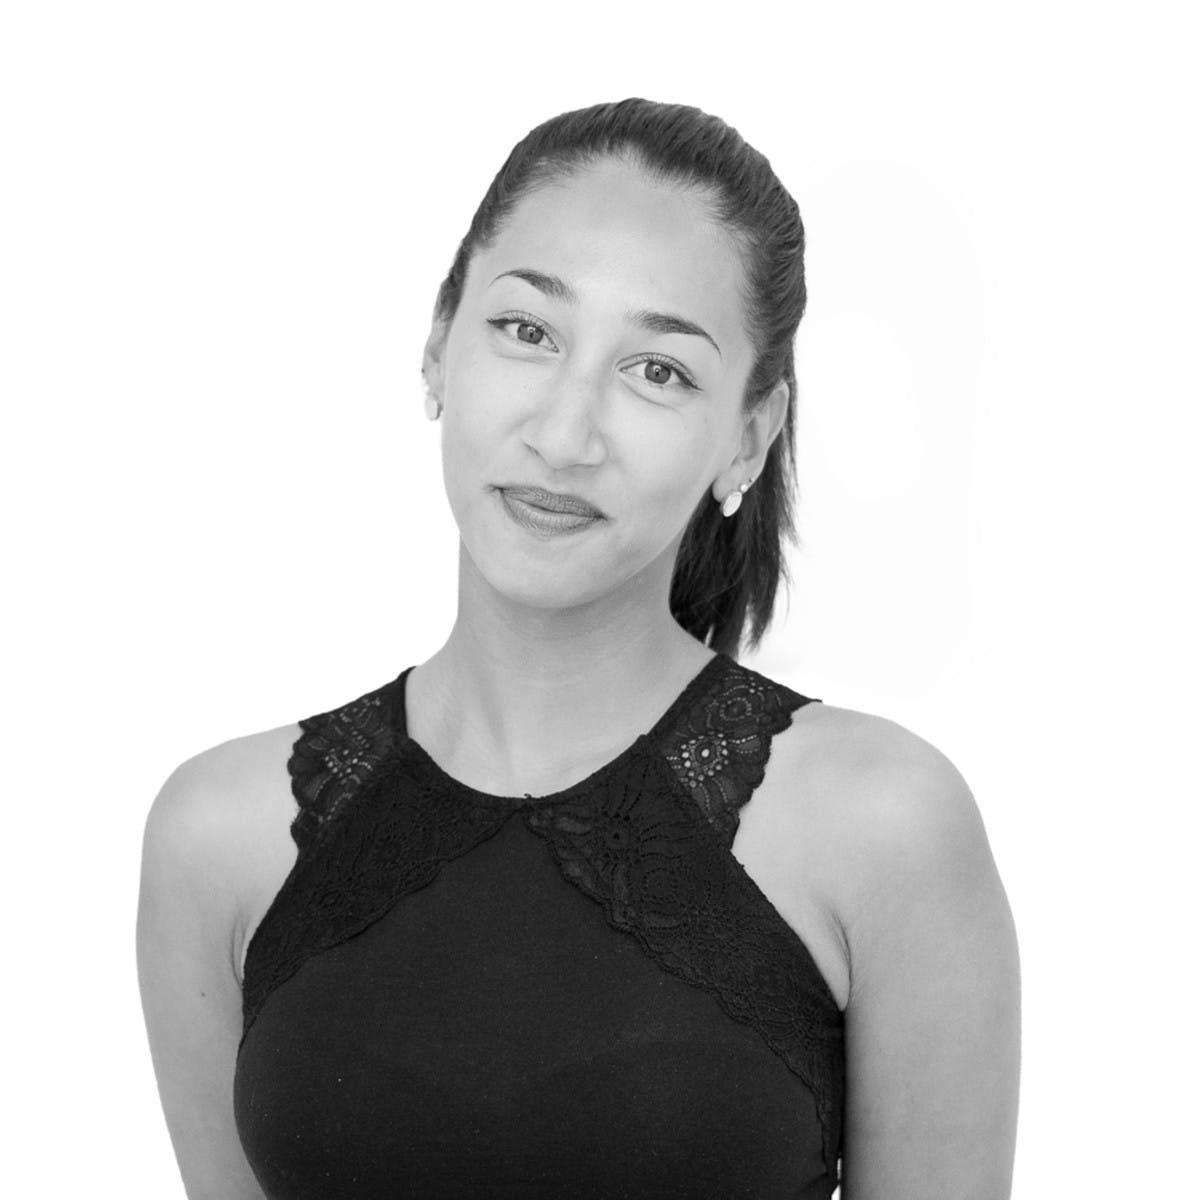 Sabrina Fustero Fernandez